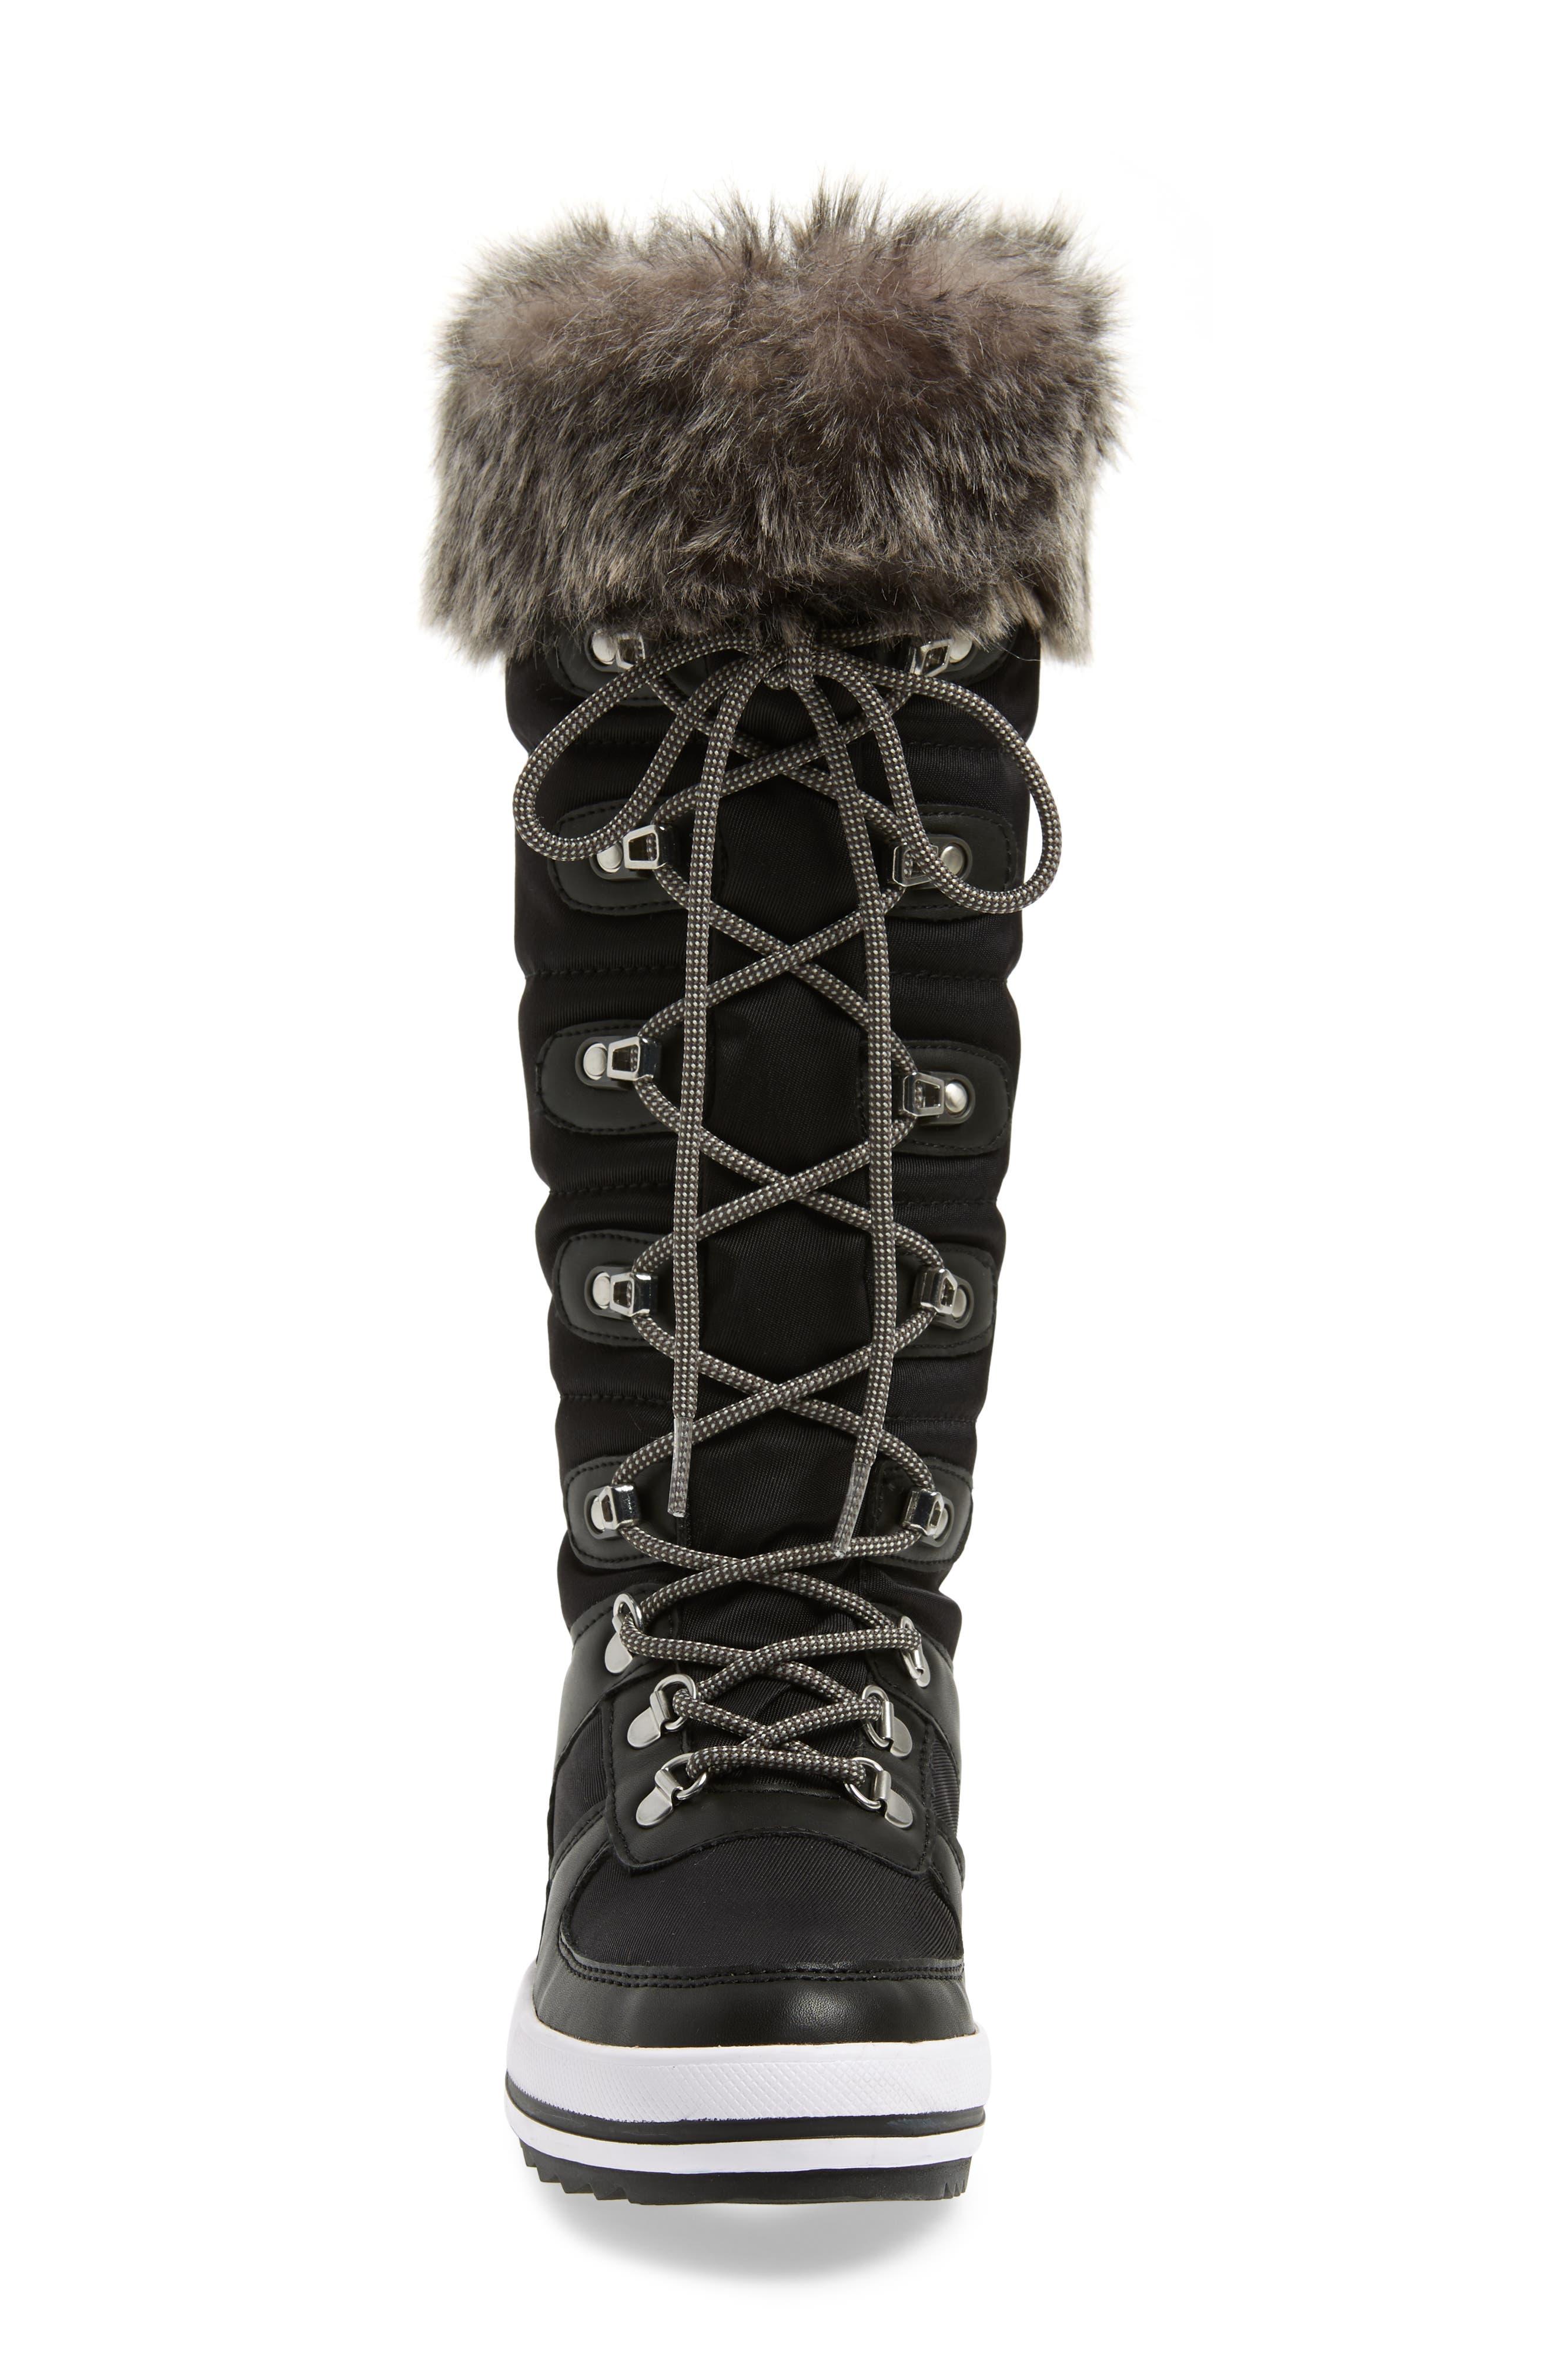 COUGAR, Vesta Faux Fur Collar Knee High Snow Boot, Alternate thumbnail 4, color, BLACK FABRIC